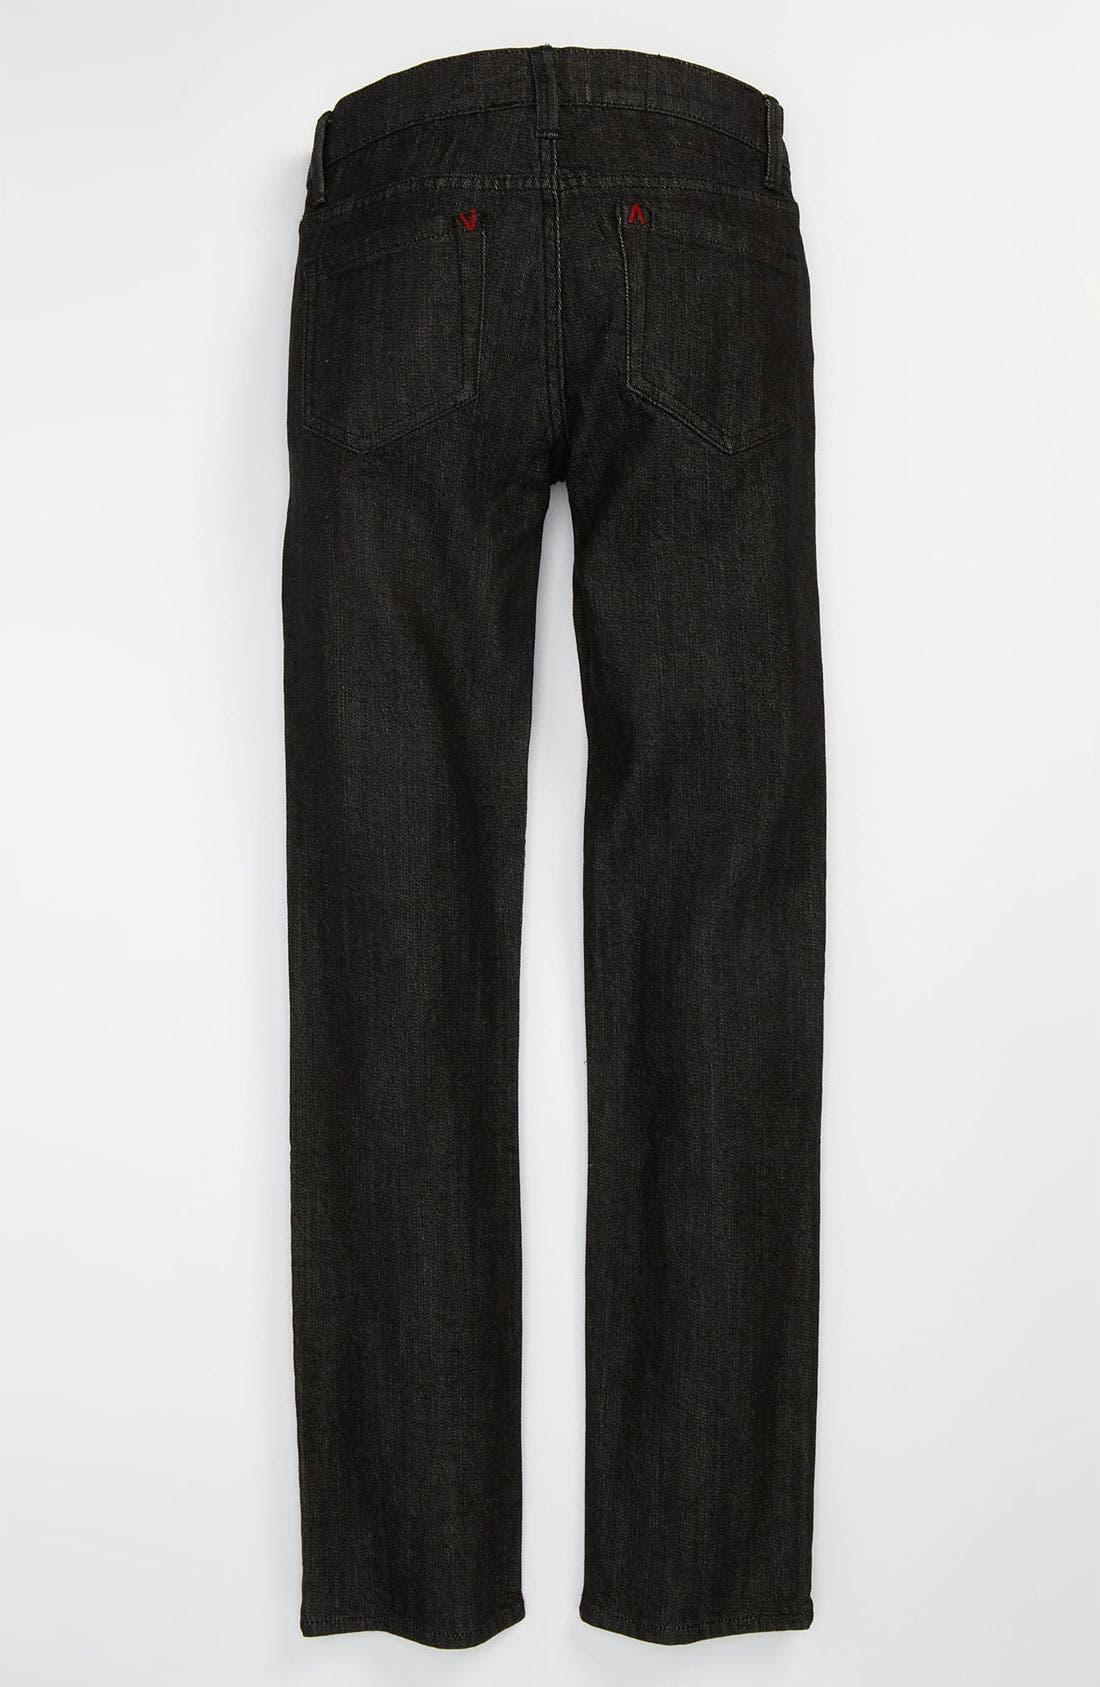 Alternate Image 1 Selected - RVCA 'Regulars' Slim Fit Jeans (Black) (Big Boys)